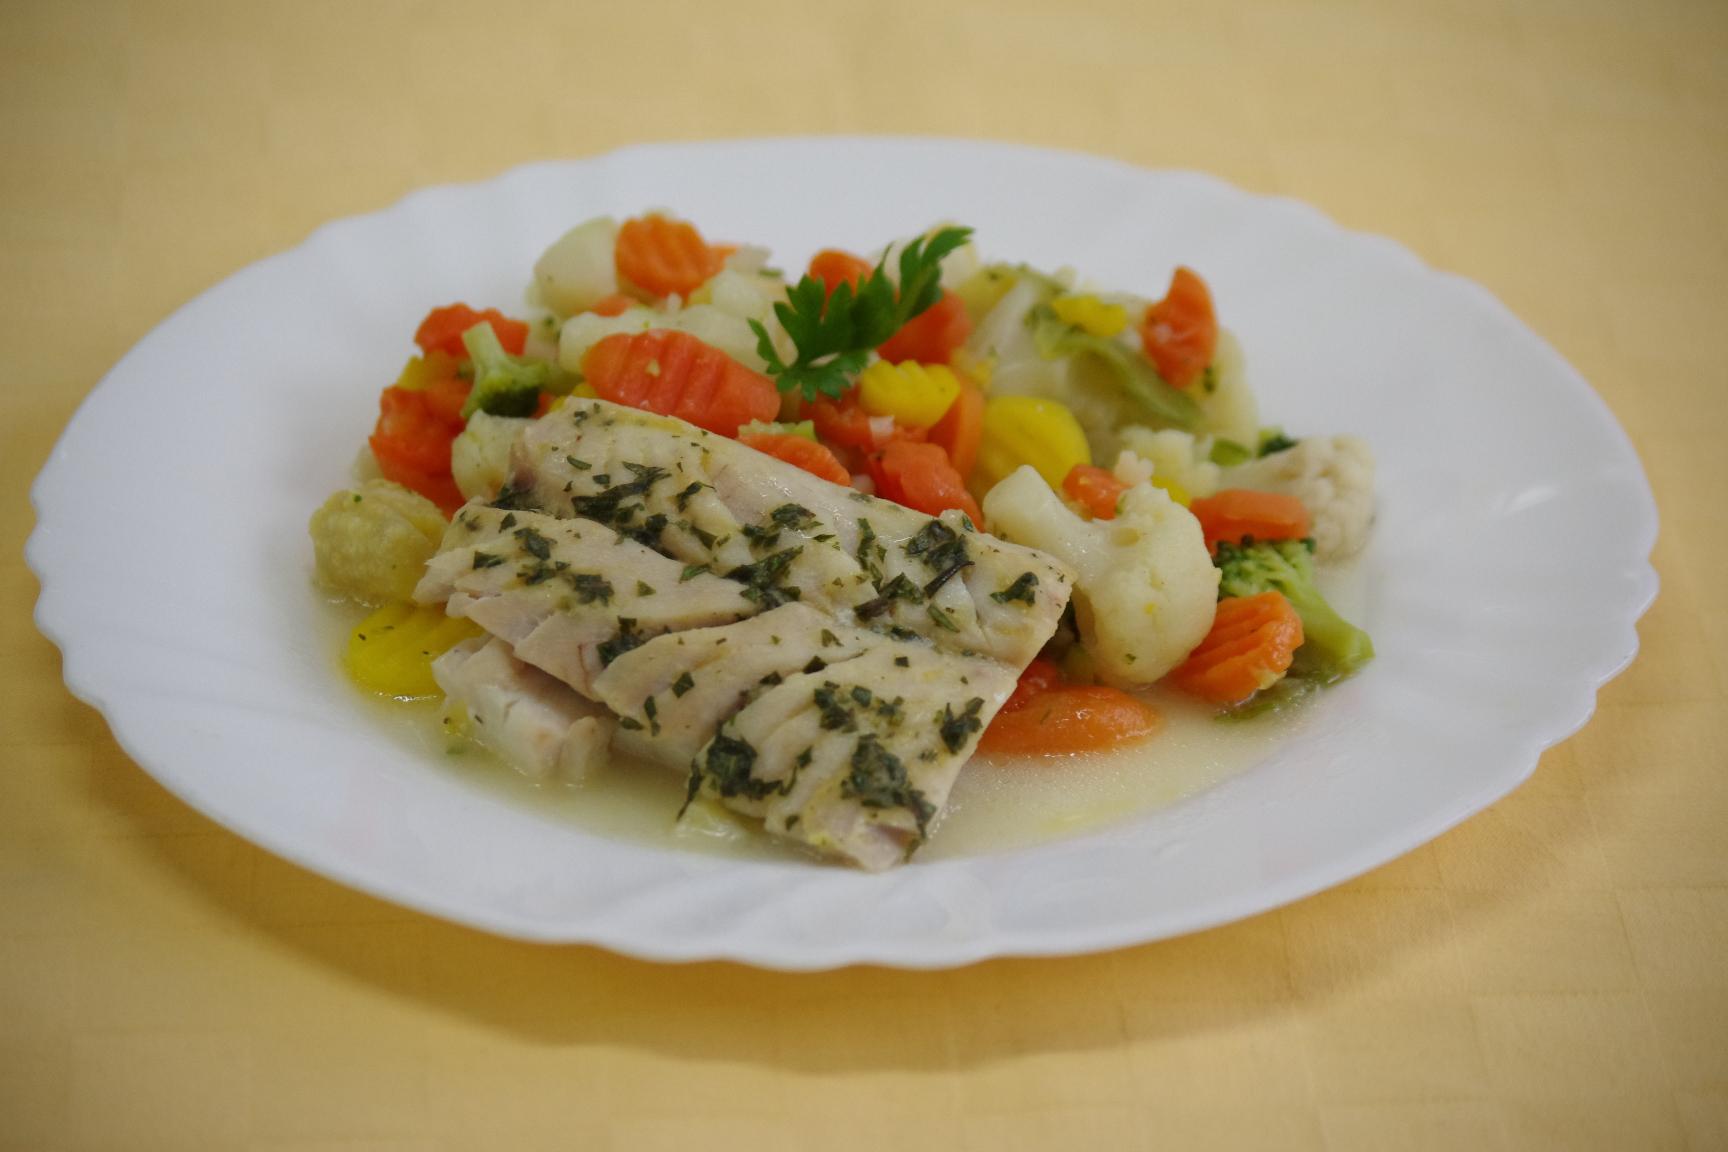 Treska tmavá pečená s bylinkovým maslom, dusená zelenina